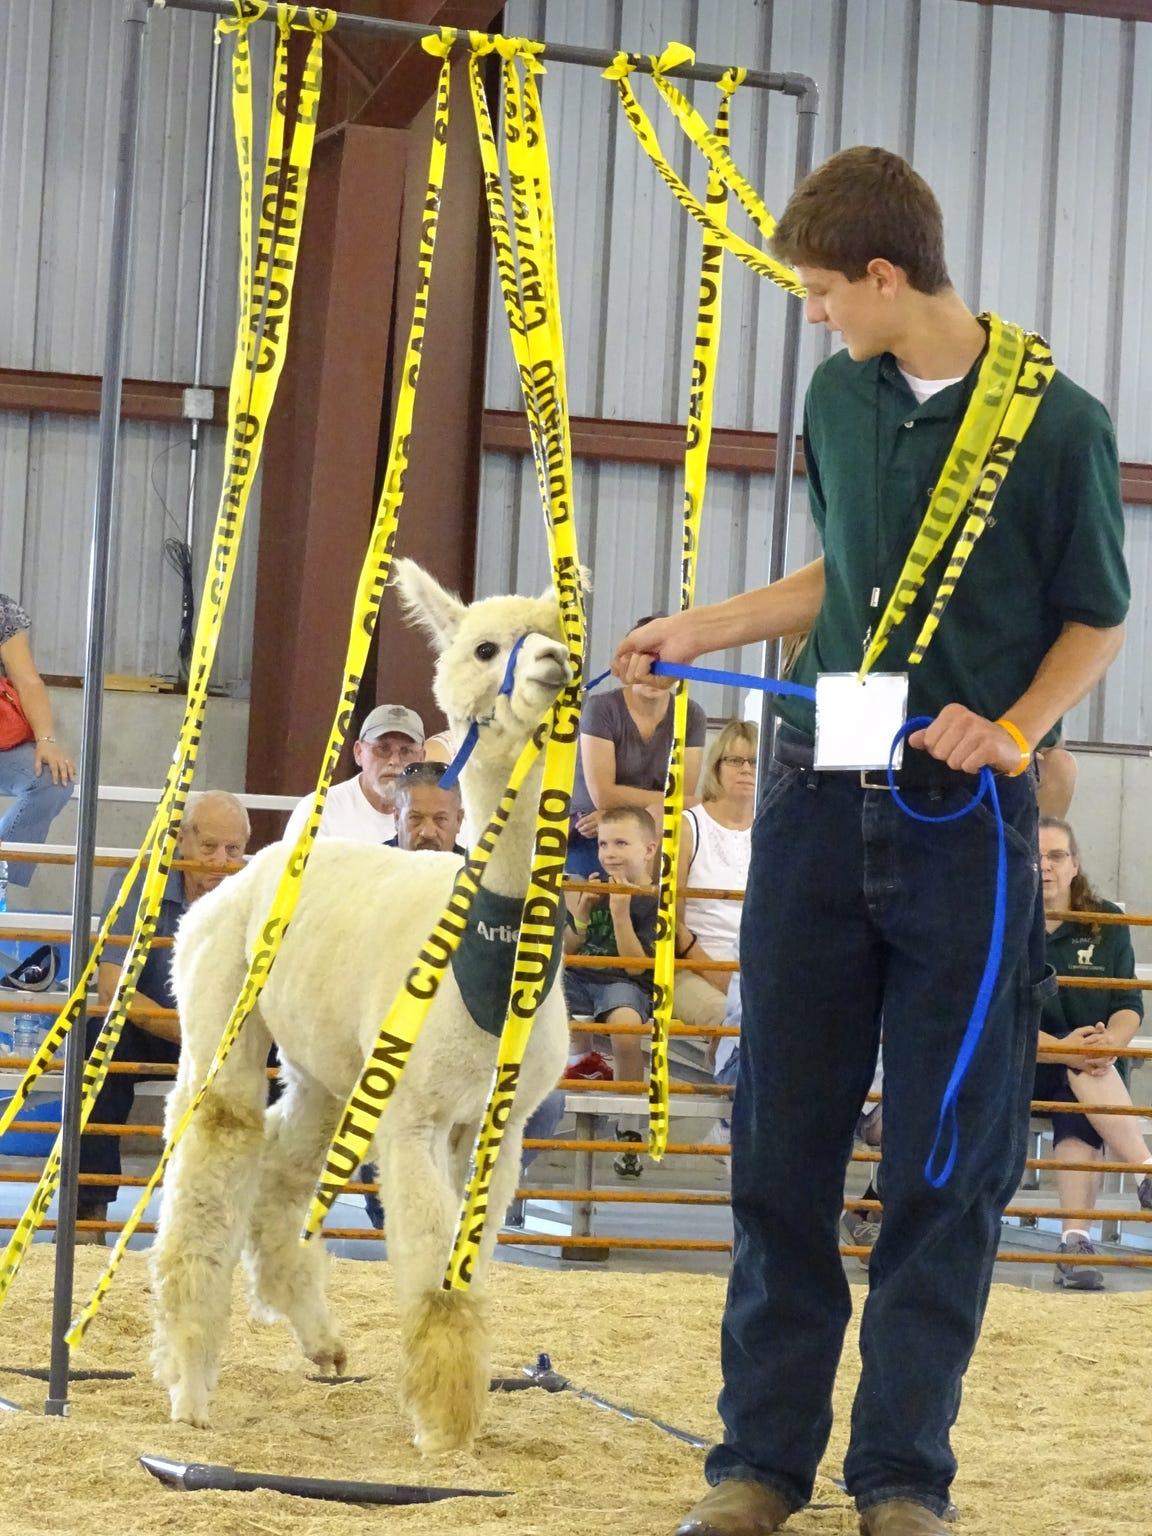 Darren Wurm, 15, coaxes his alpaca through an obstacle